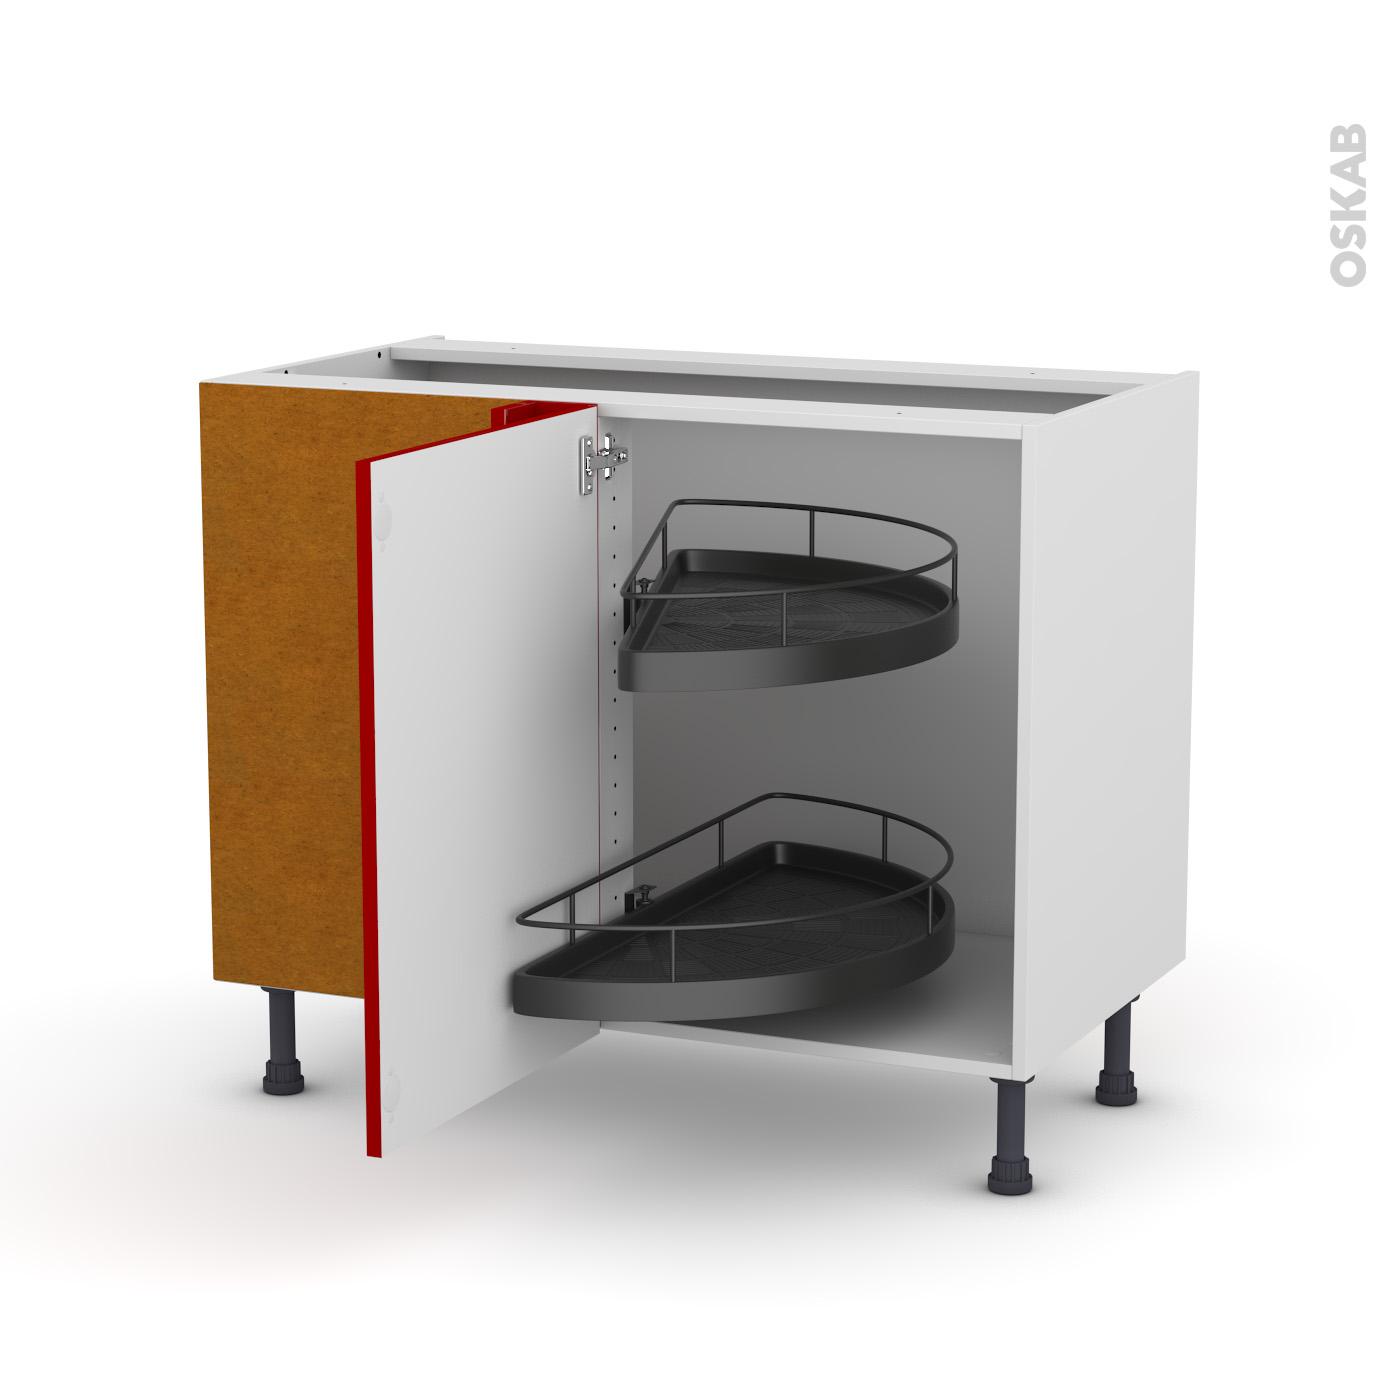 meuble de cuisine angle bas stecia rouge demi lune epoxy 1 porte n ... - Meuble Angle Bas Cuisine